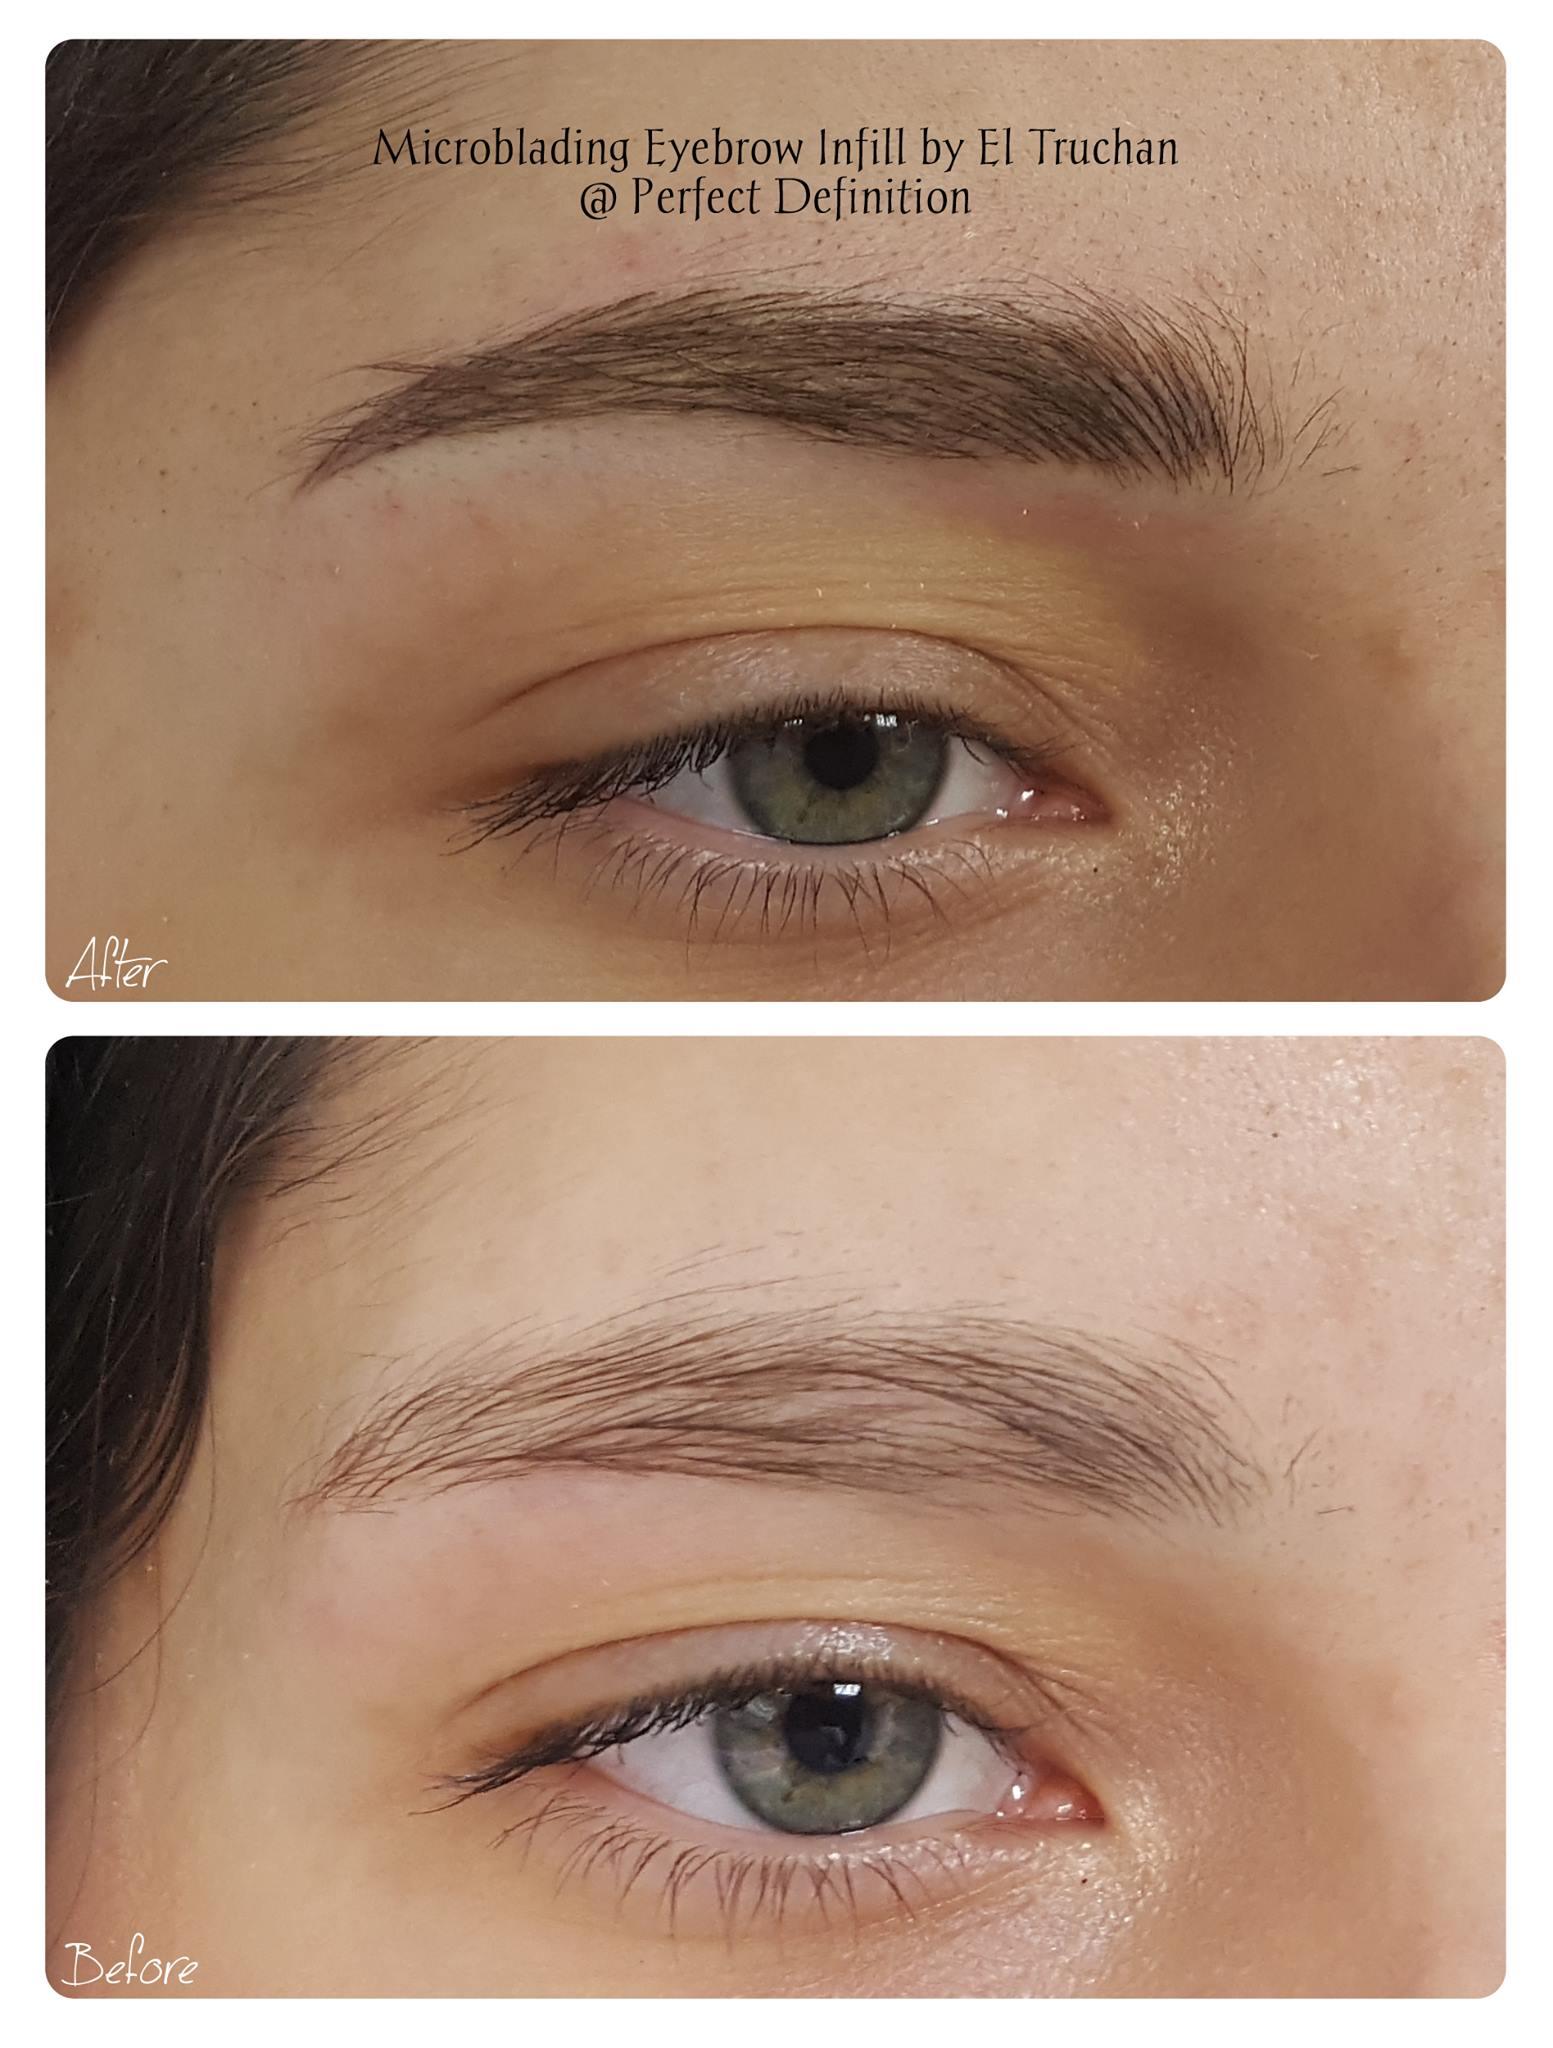 Microblading Eyebrow Infill